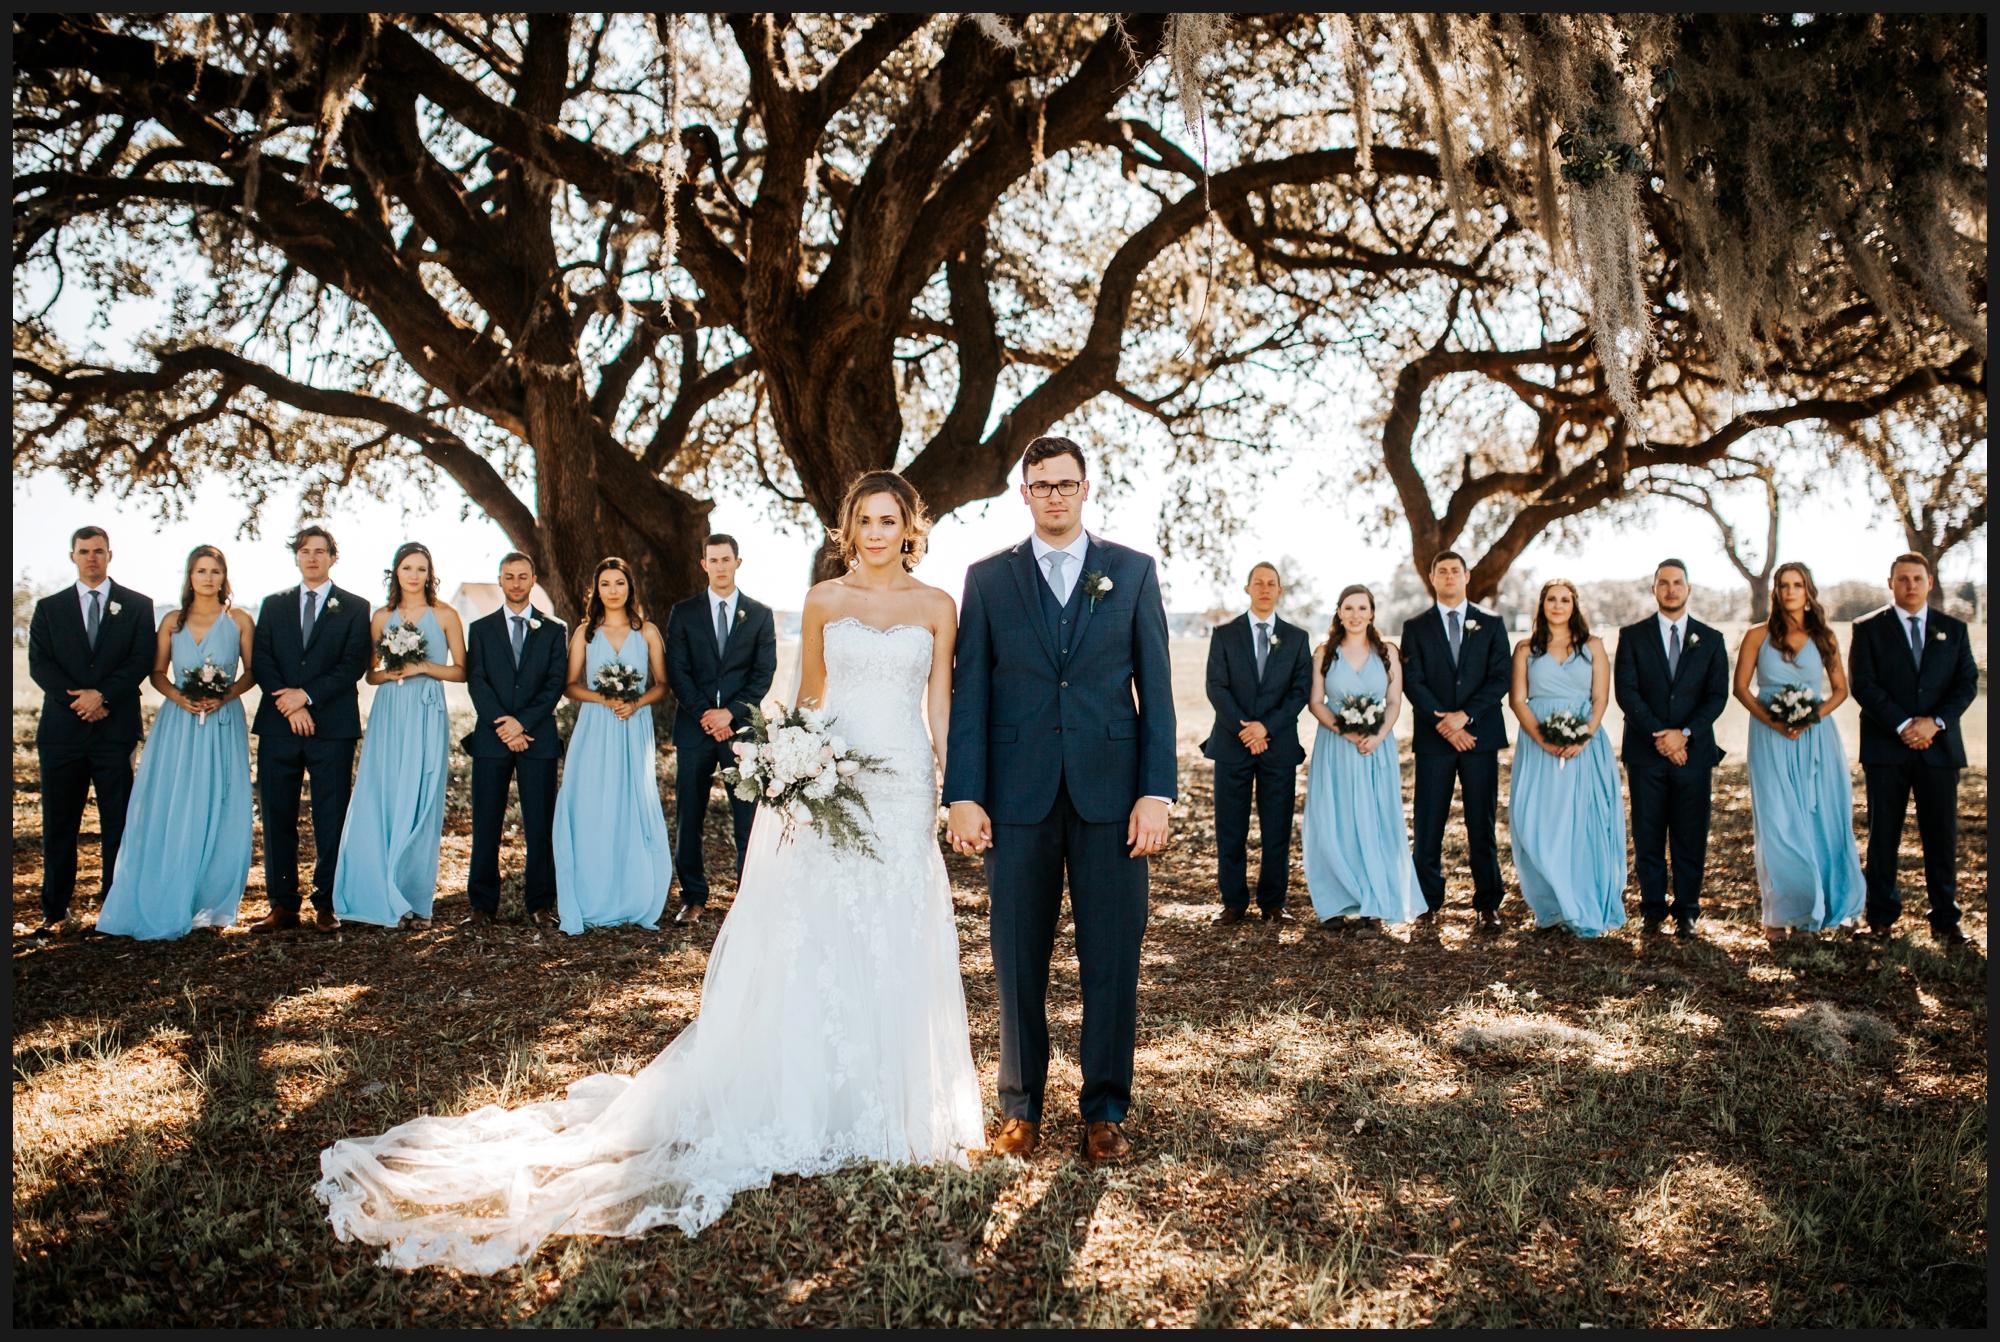 Orlando-Wedding-Photographer-destination-wedding-photographer-florida-wedding-photographer-bohemian-wedding-photographer_0077.jpg